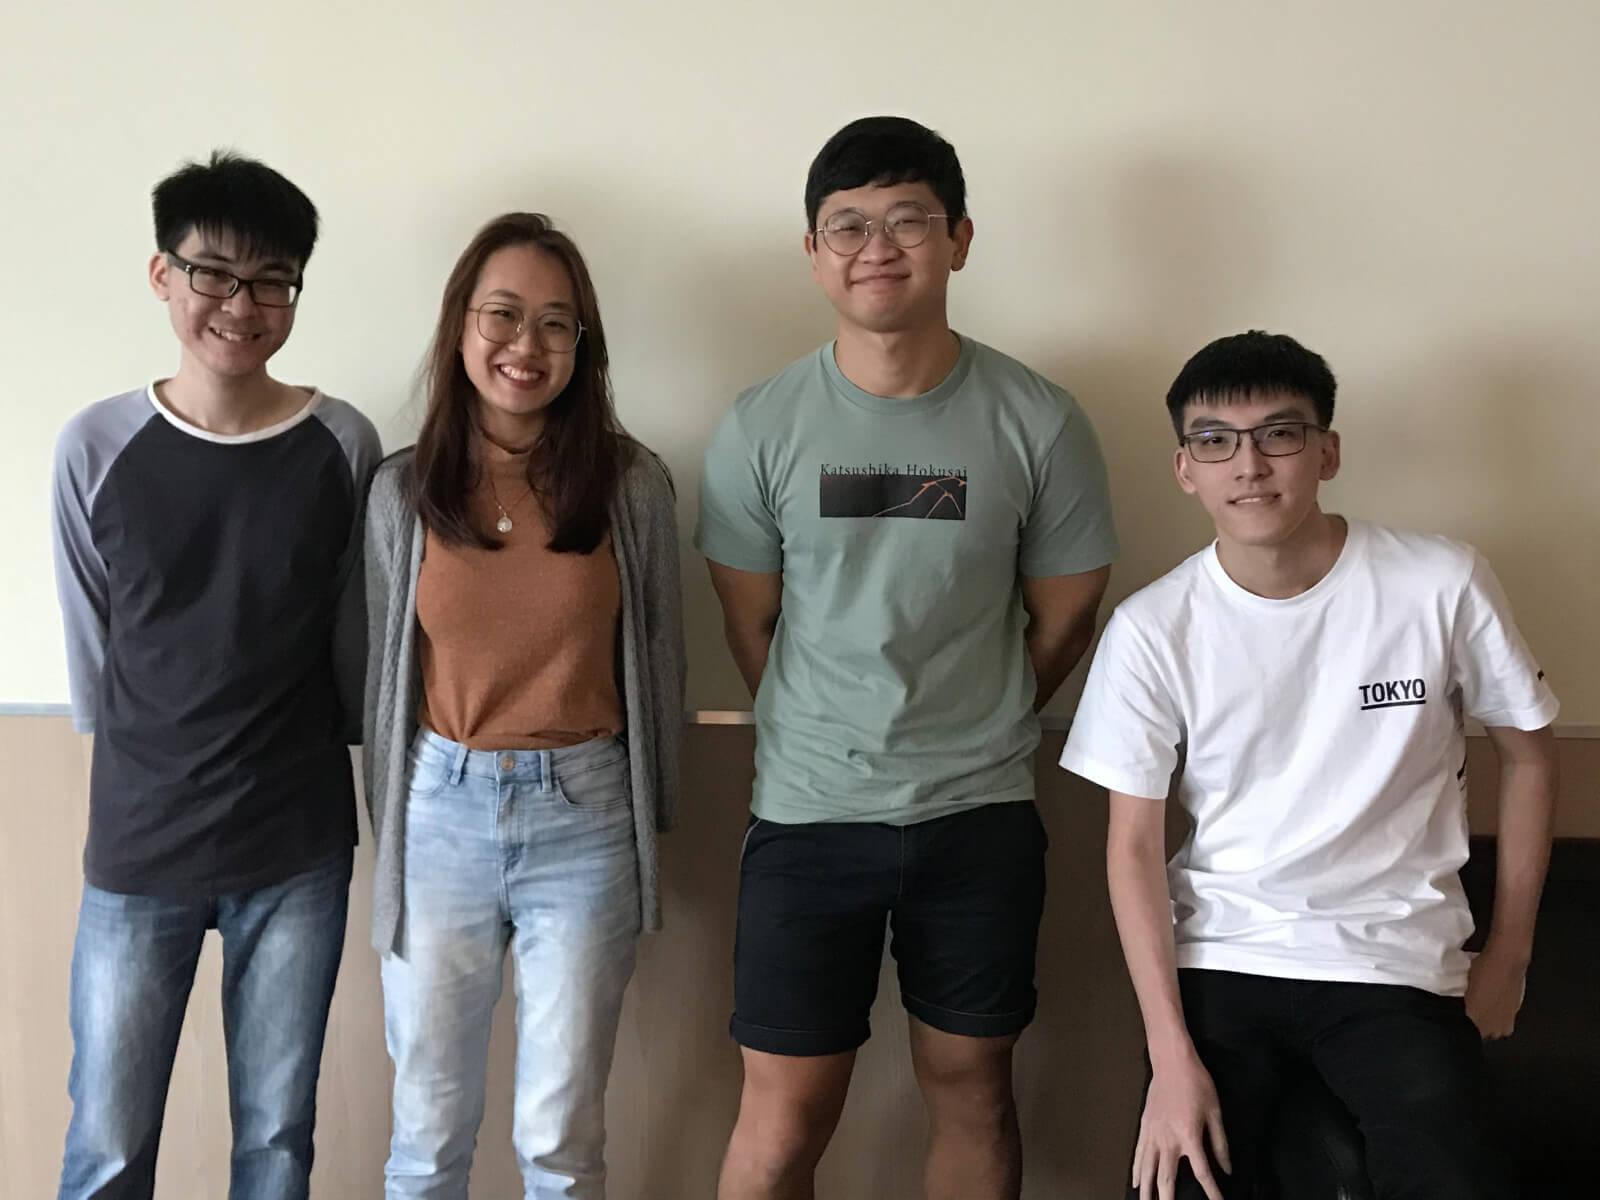 DigiPen (Singapore) students Wee Ding Wei, Lim Ziyi Jean, Ng Li Wang Ryan, and Malcolm Lim Hong Cheng.